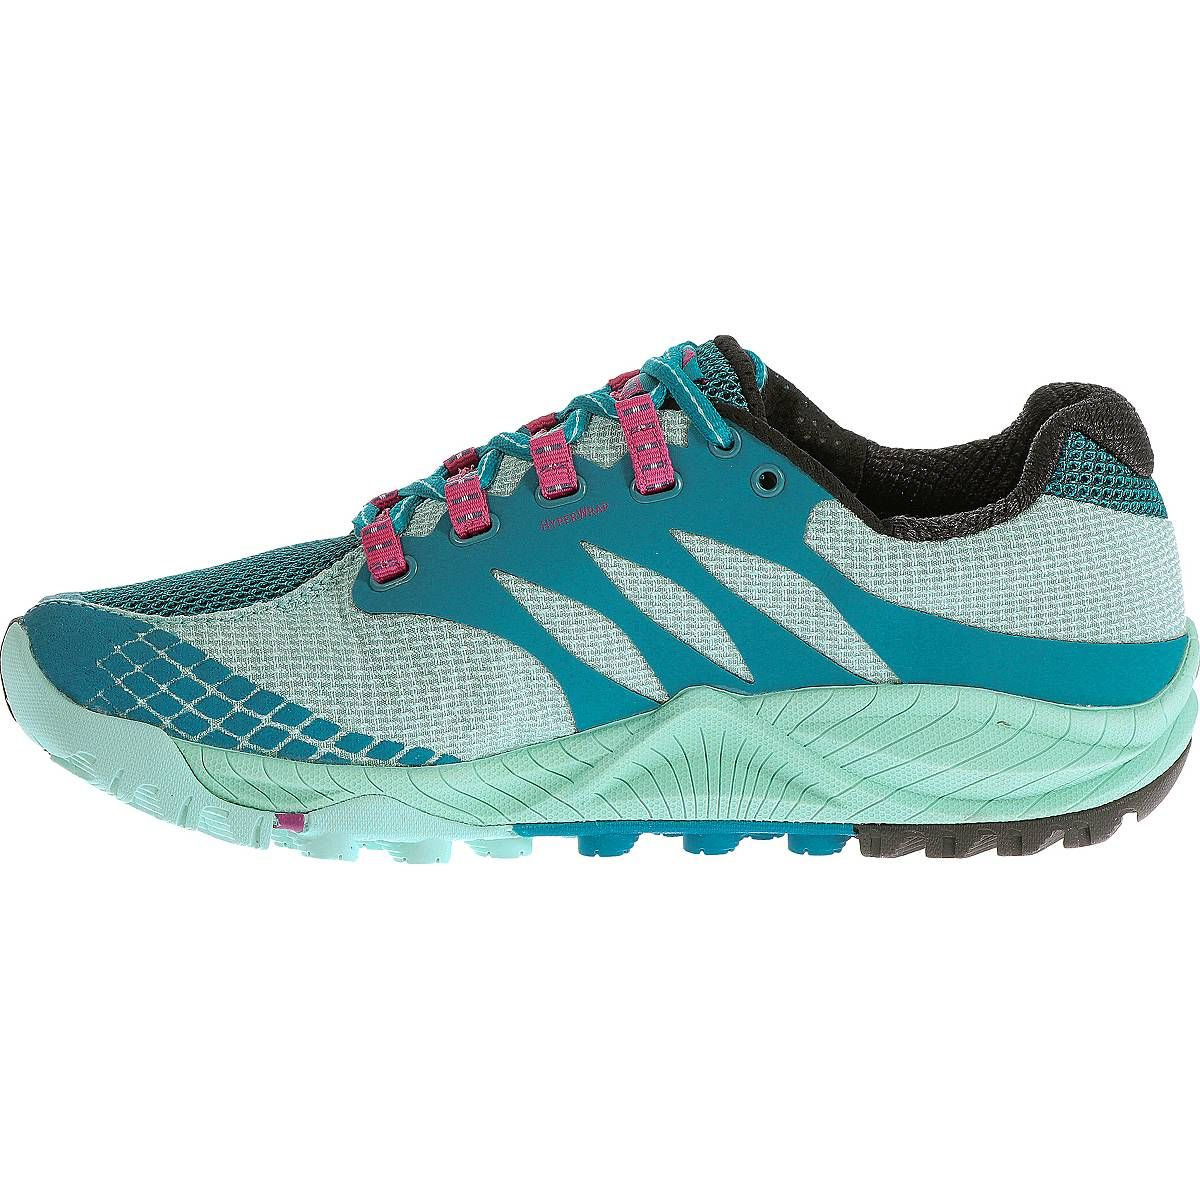 Merrell Running Shoes Unifly